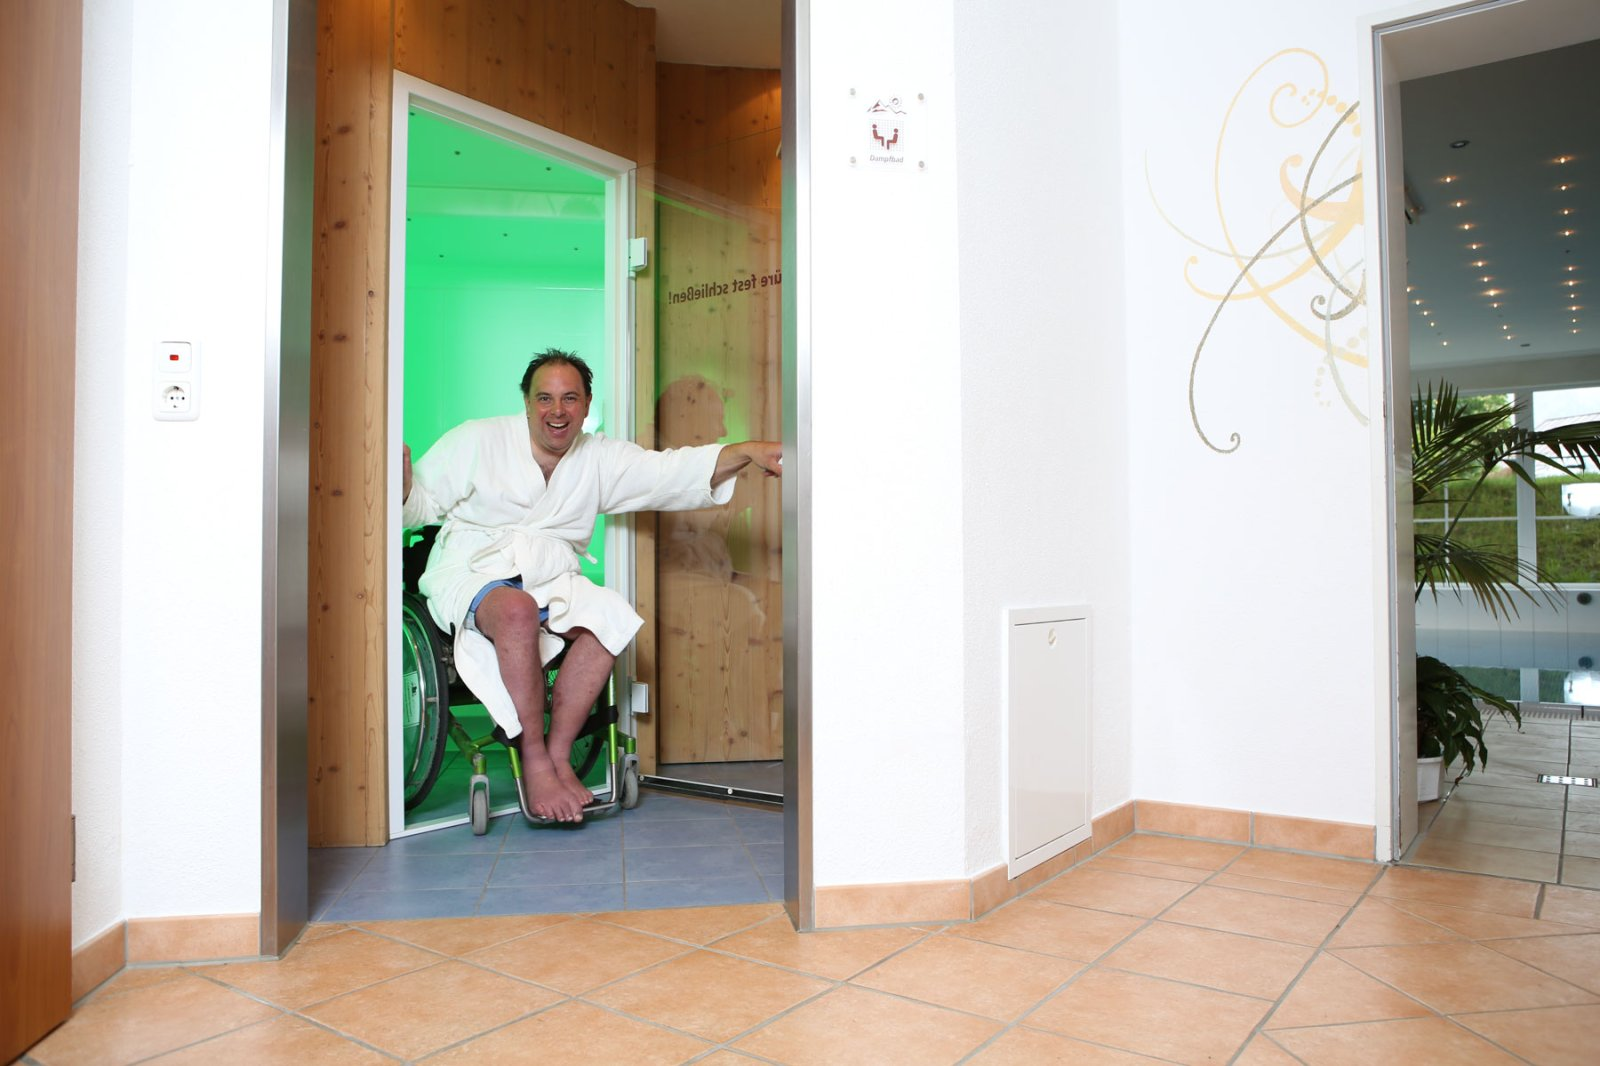 Waschbecken Hohe Rollstuhlfahrer Zimmer And Suiten Ellington Hotel